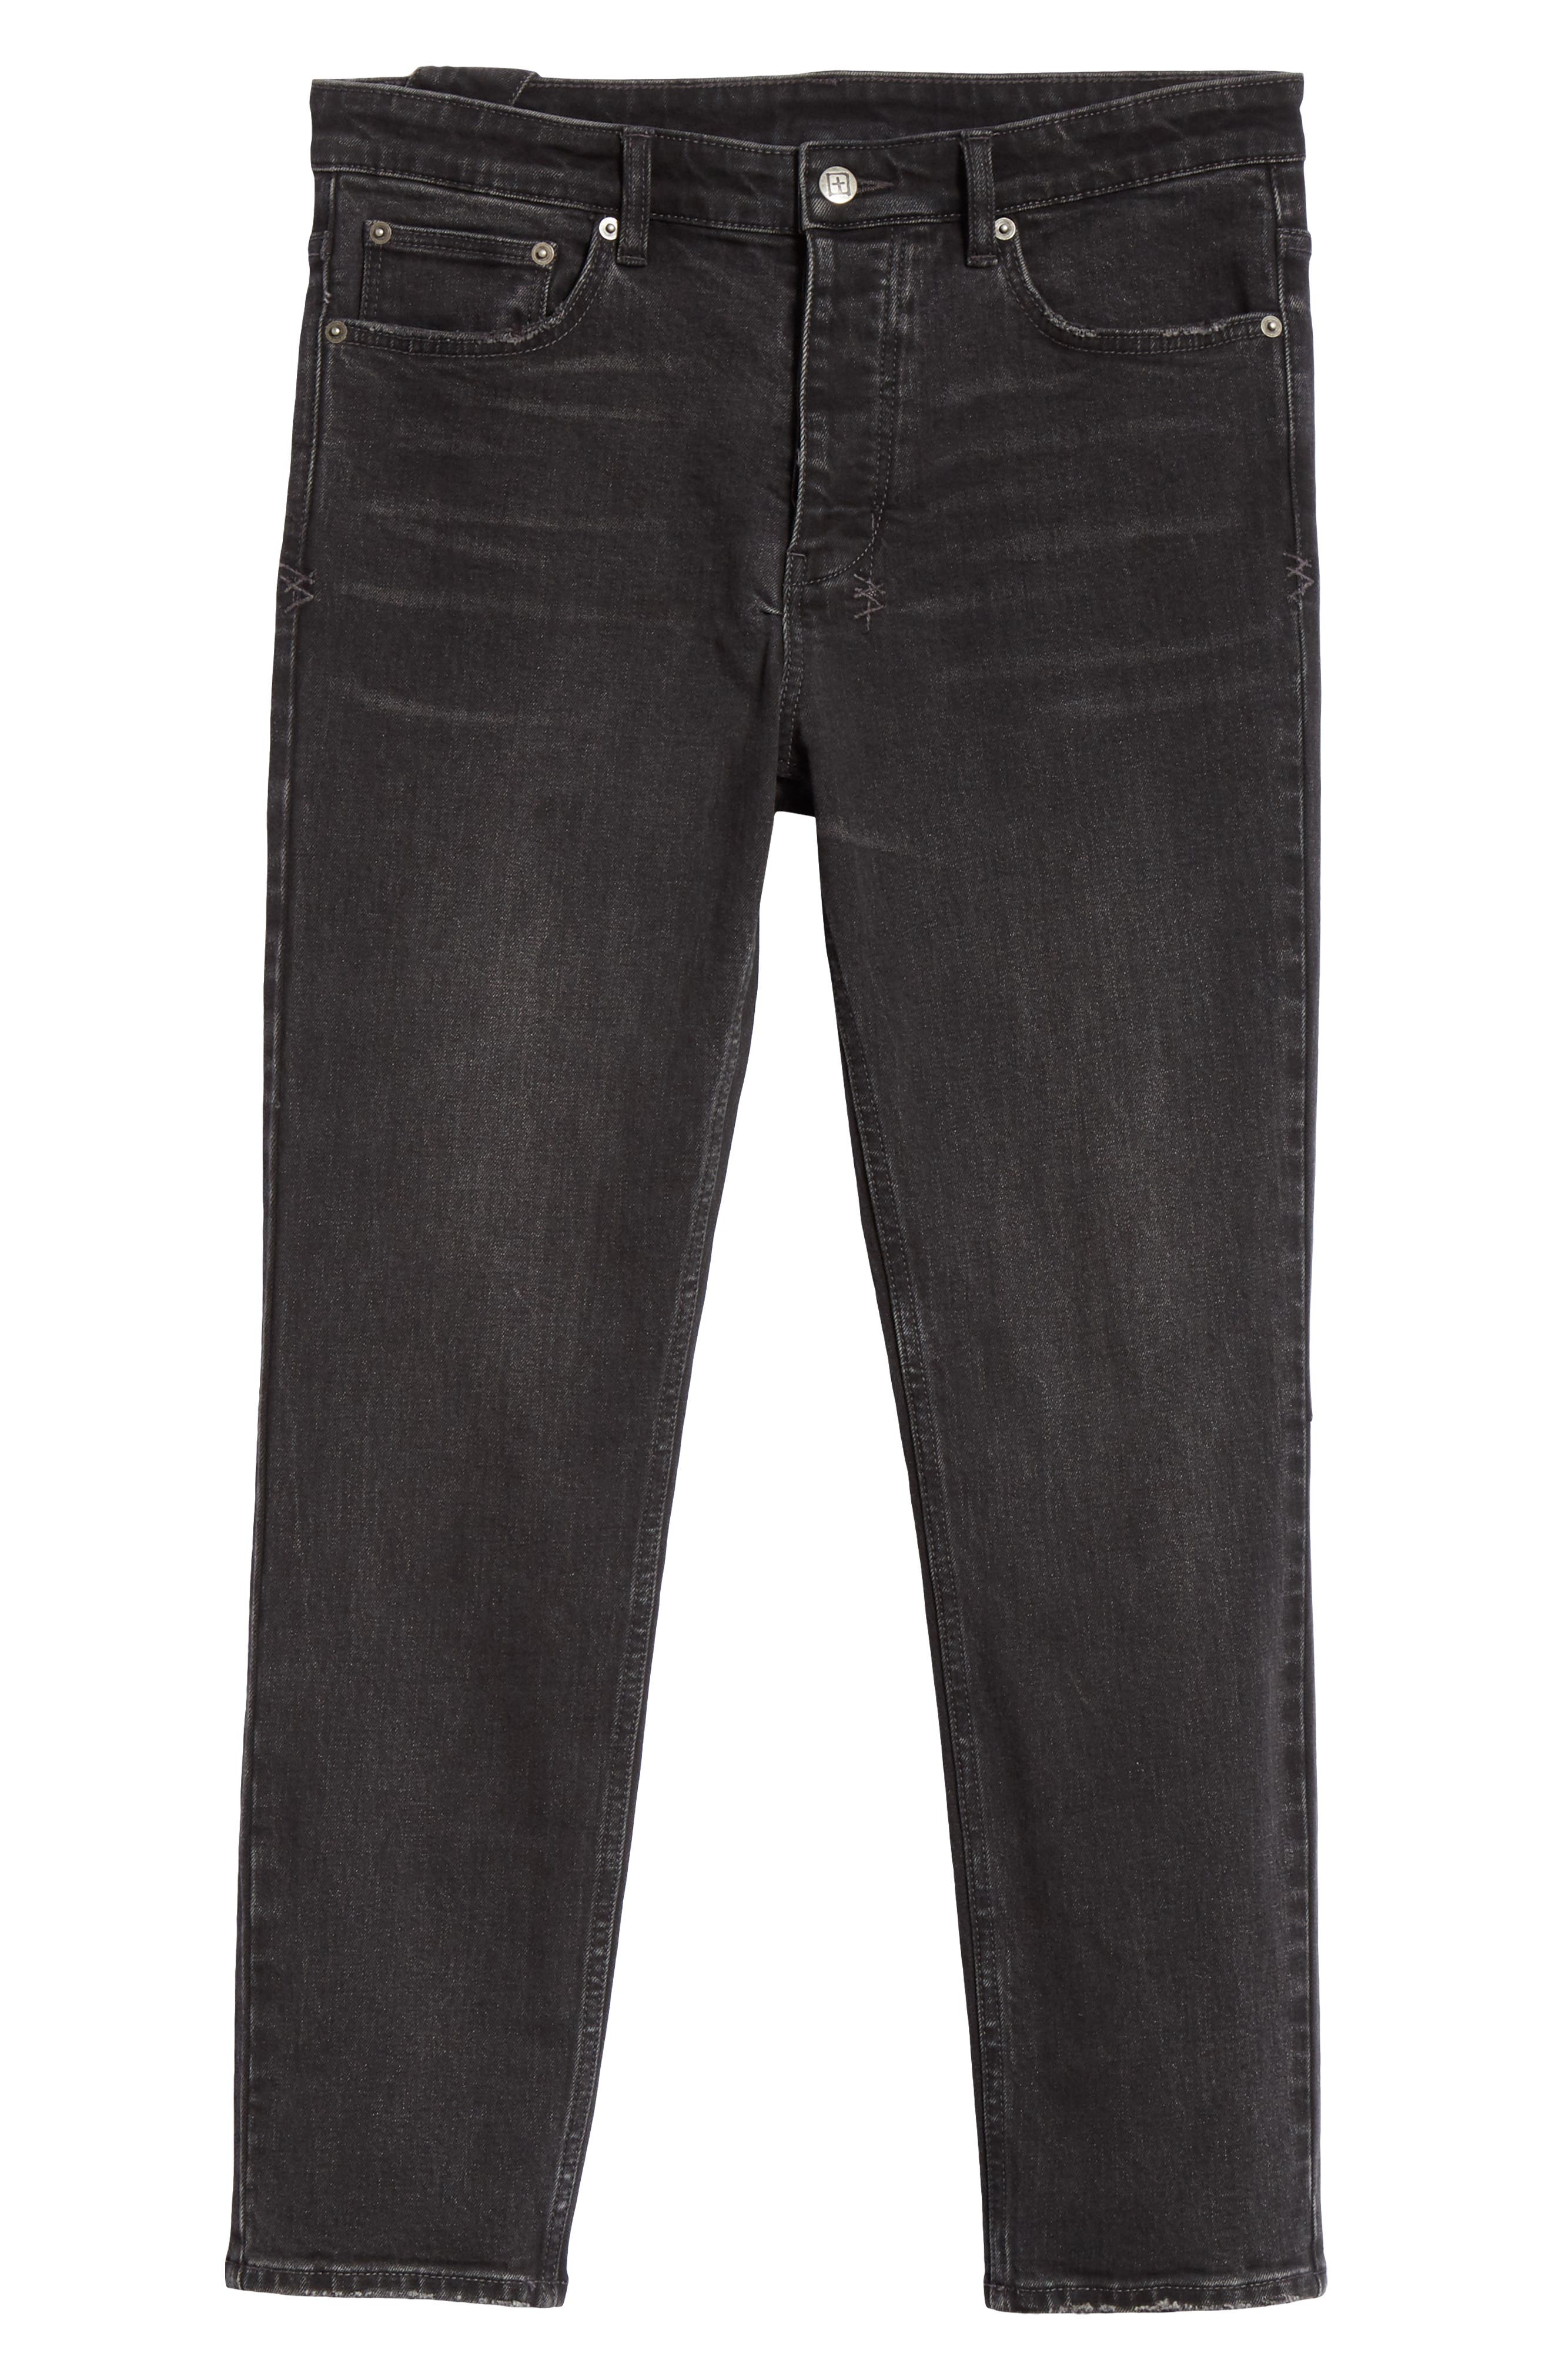 KSUBI, Chitch Hard Rock Skinny Fit Crop Jeans, Alternate thumbnail 6, color, BLACK